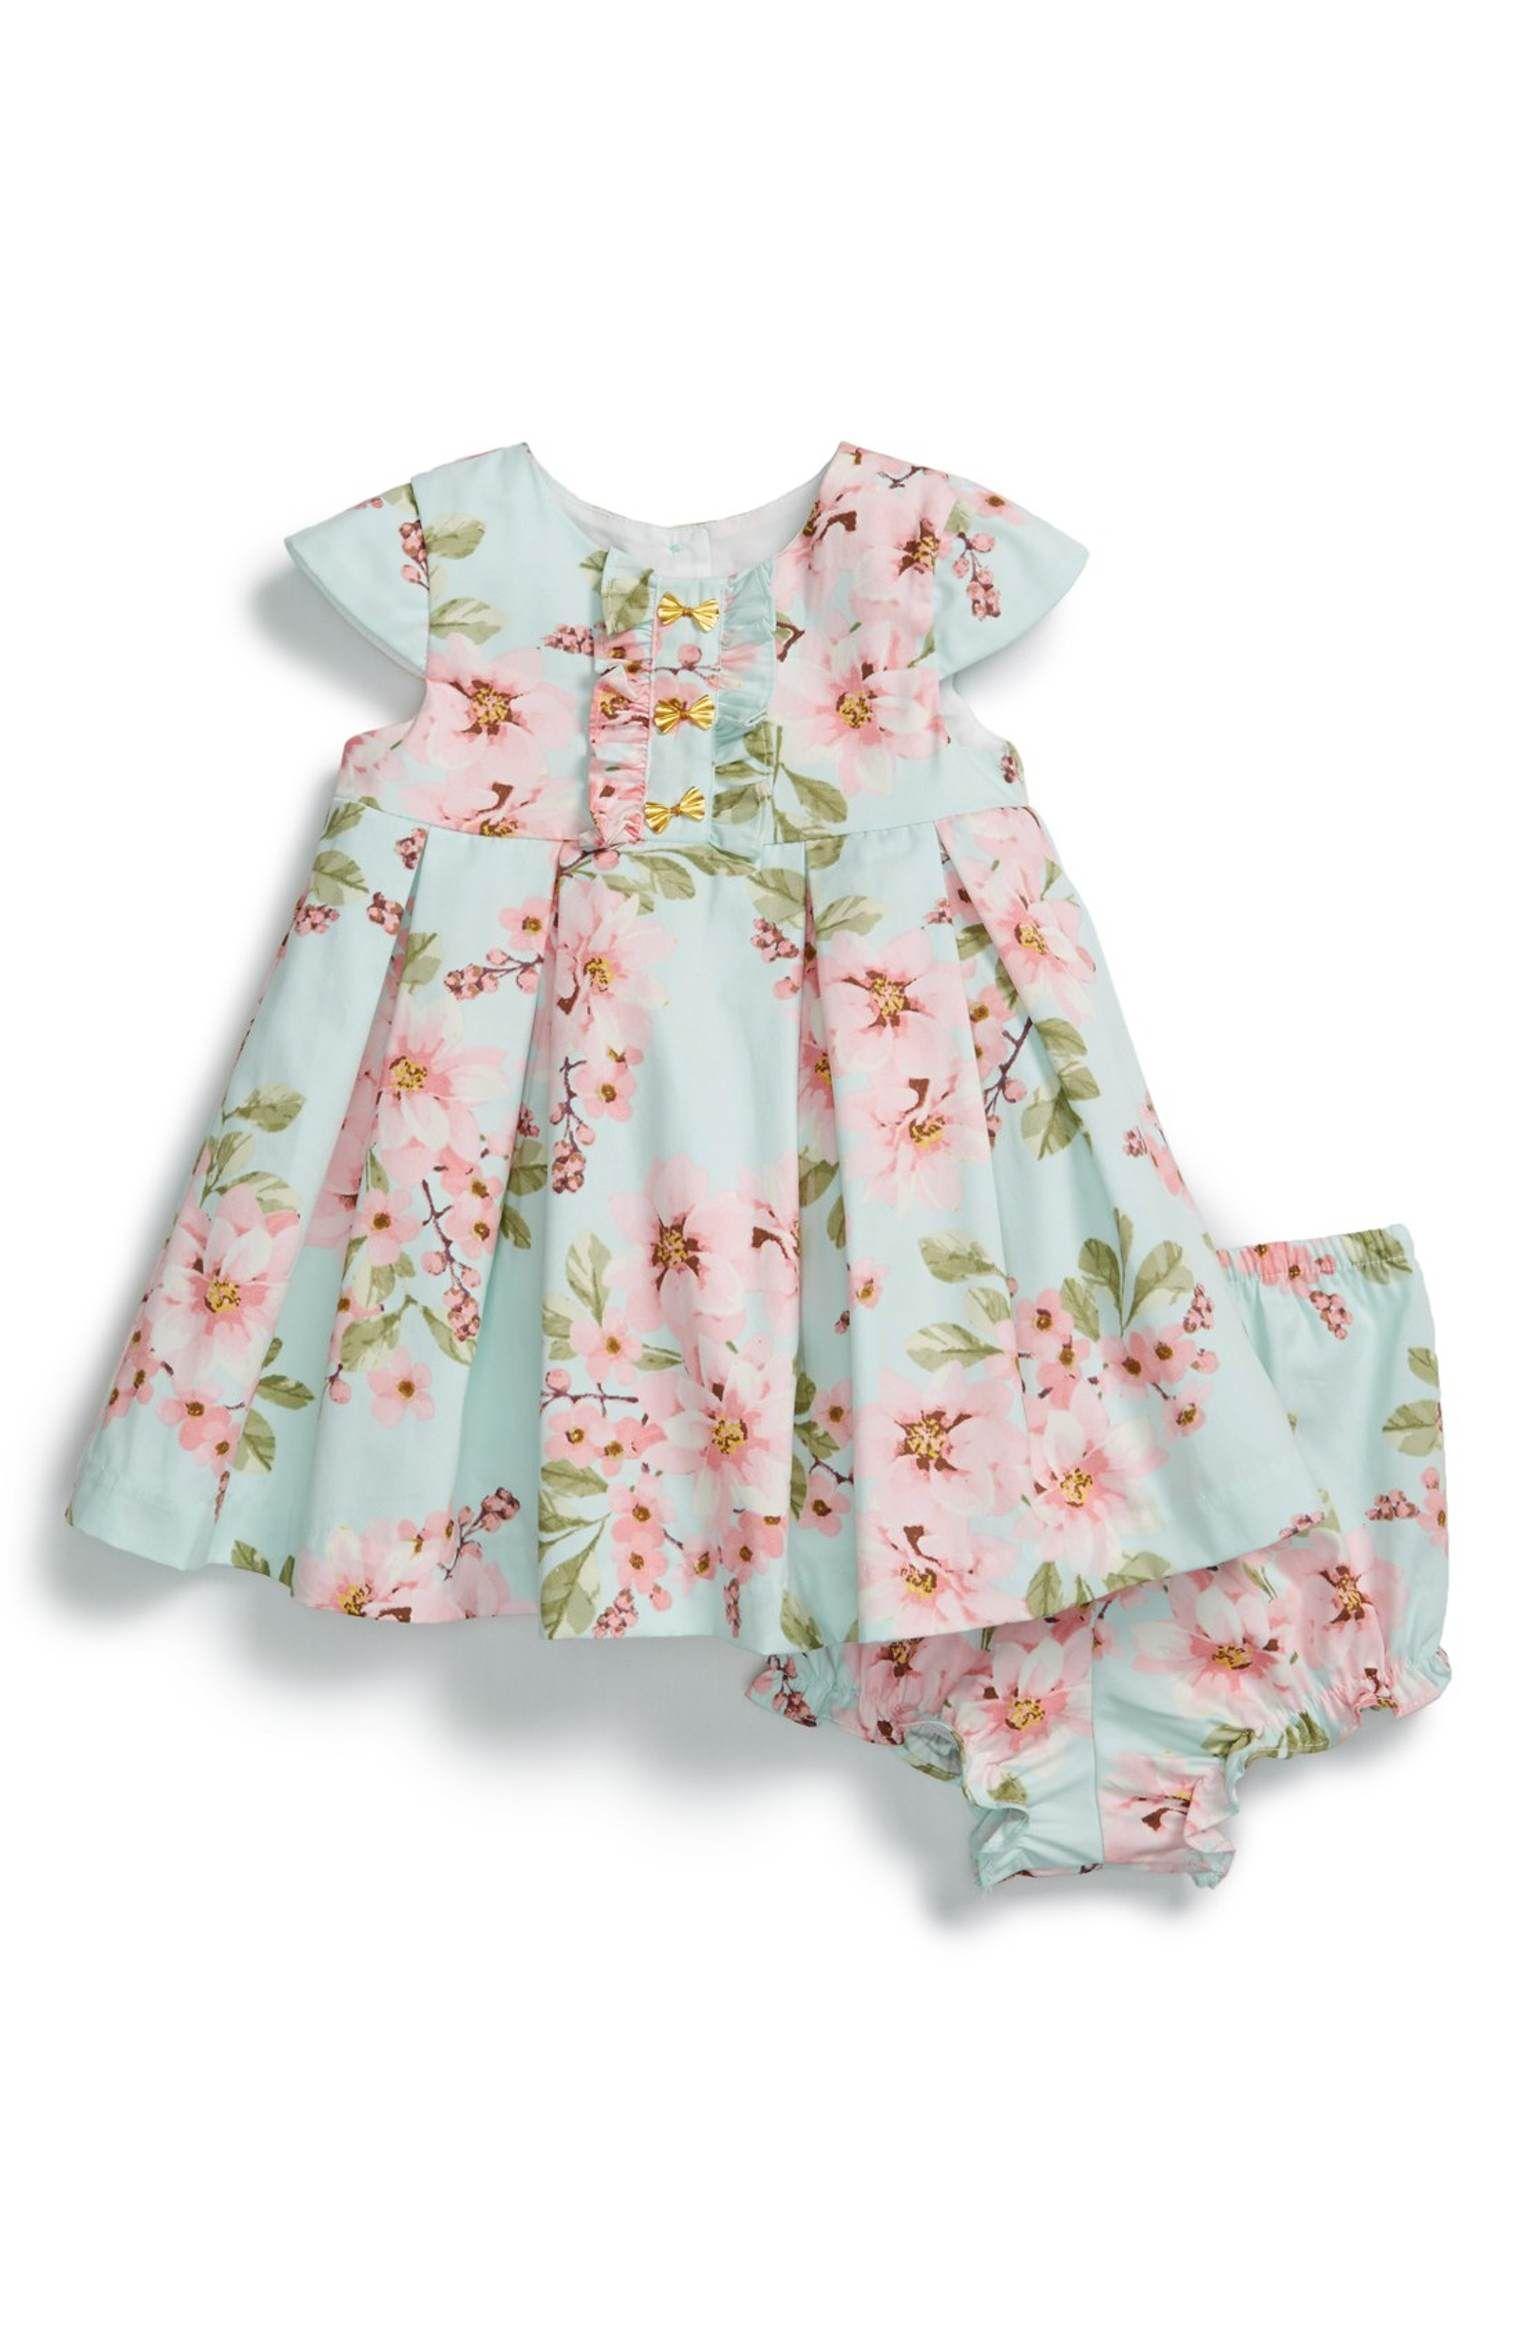 Main Image Pippa & Julie Floral Print Dress & Bloomers Baby Girls